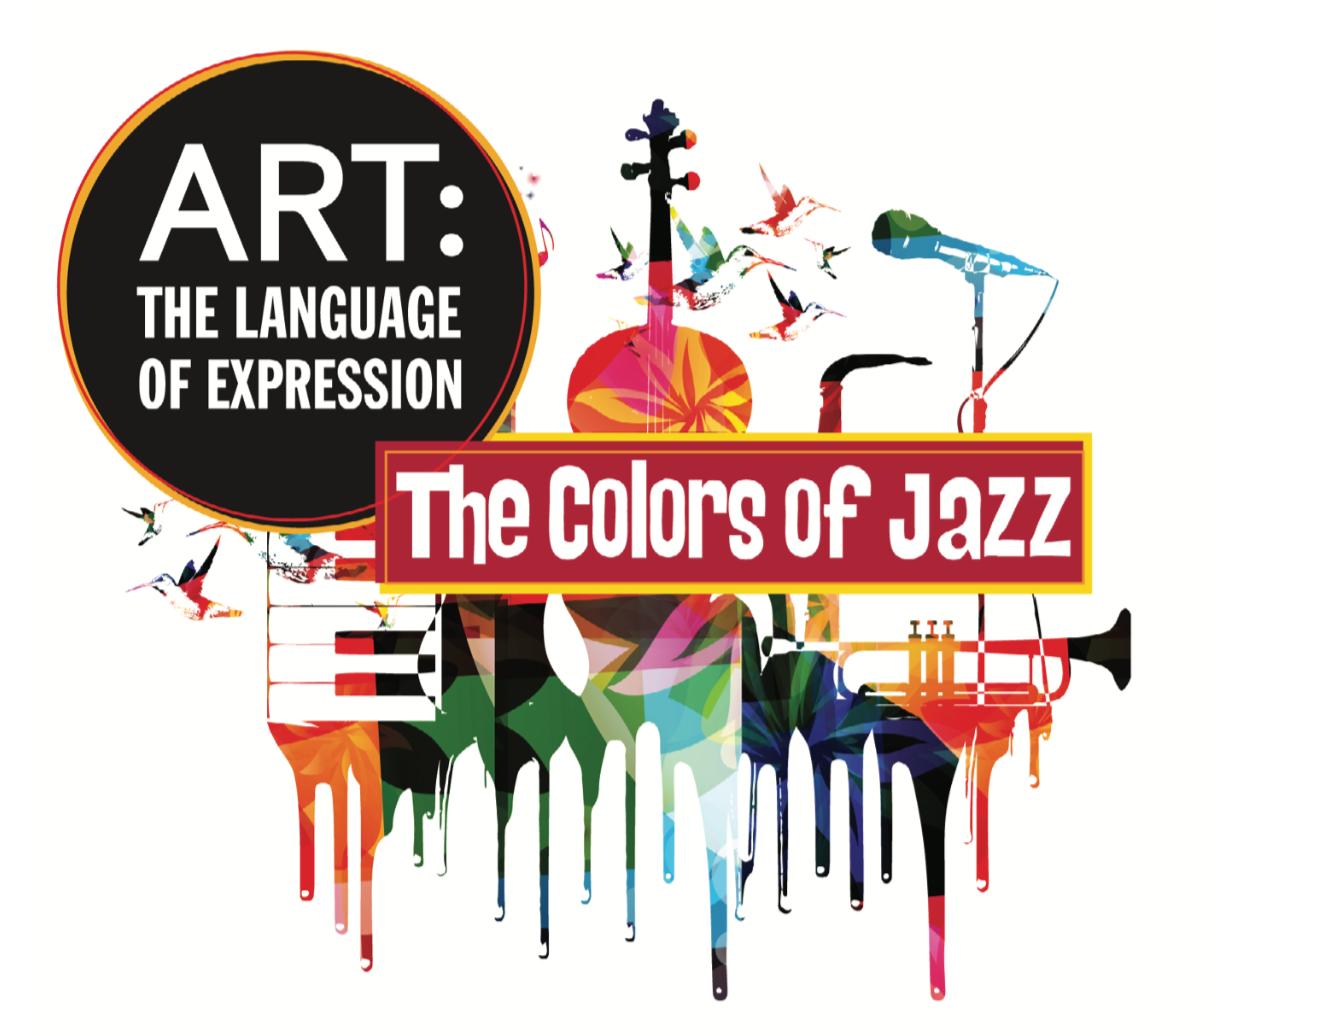 Arts Council Presents Unique Jazz Concert, Art: The Language of Expression Colors of Jazz